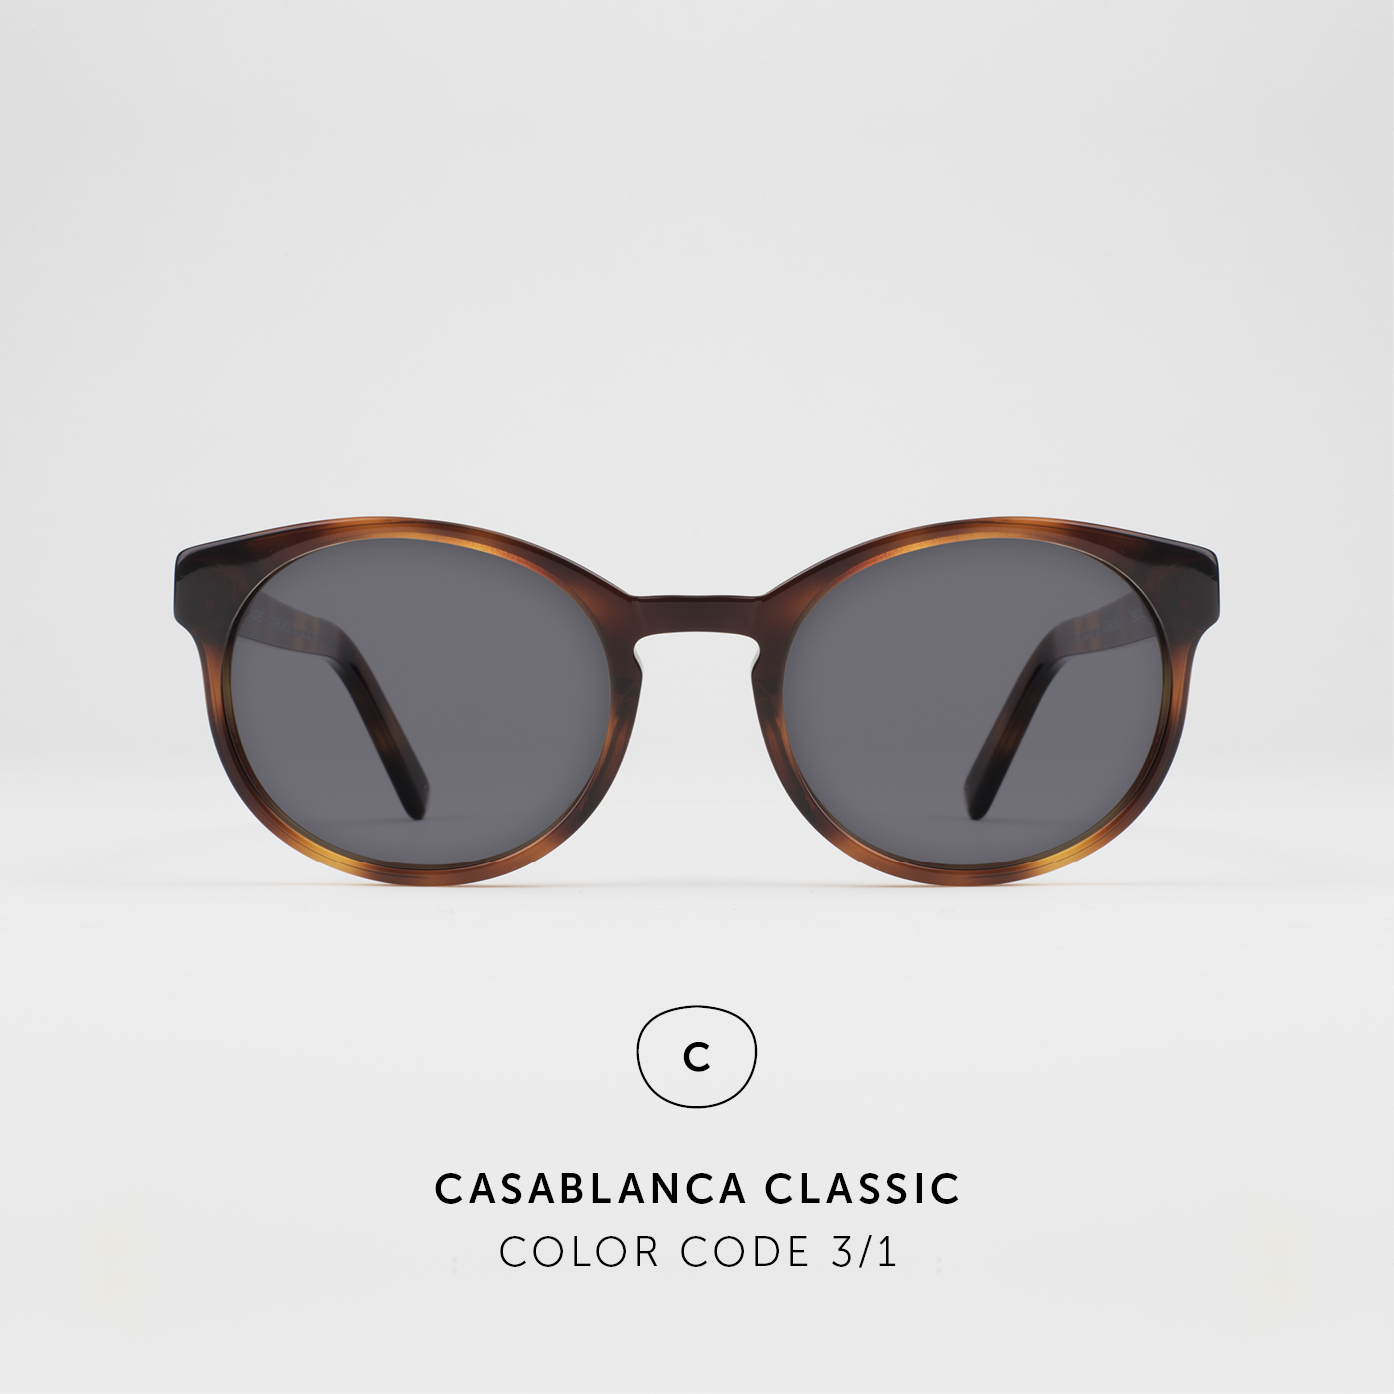 CasablancaClassic24.jpg